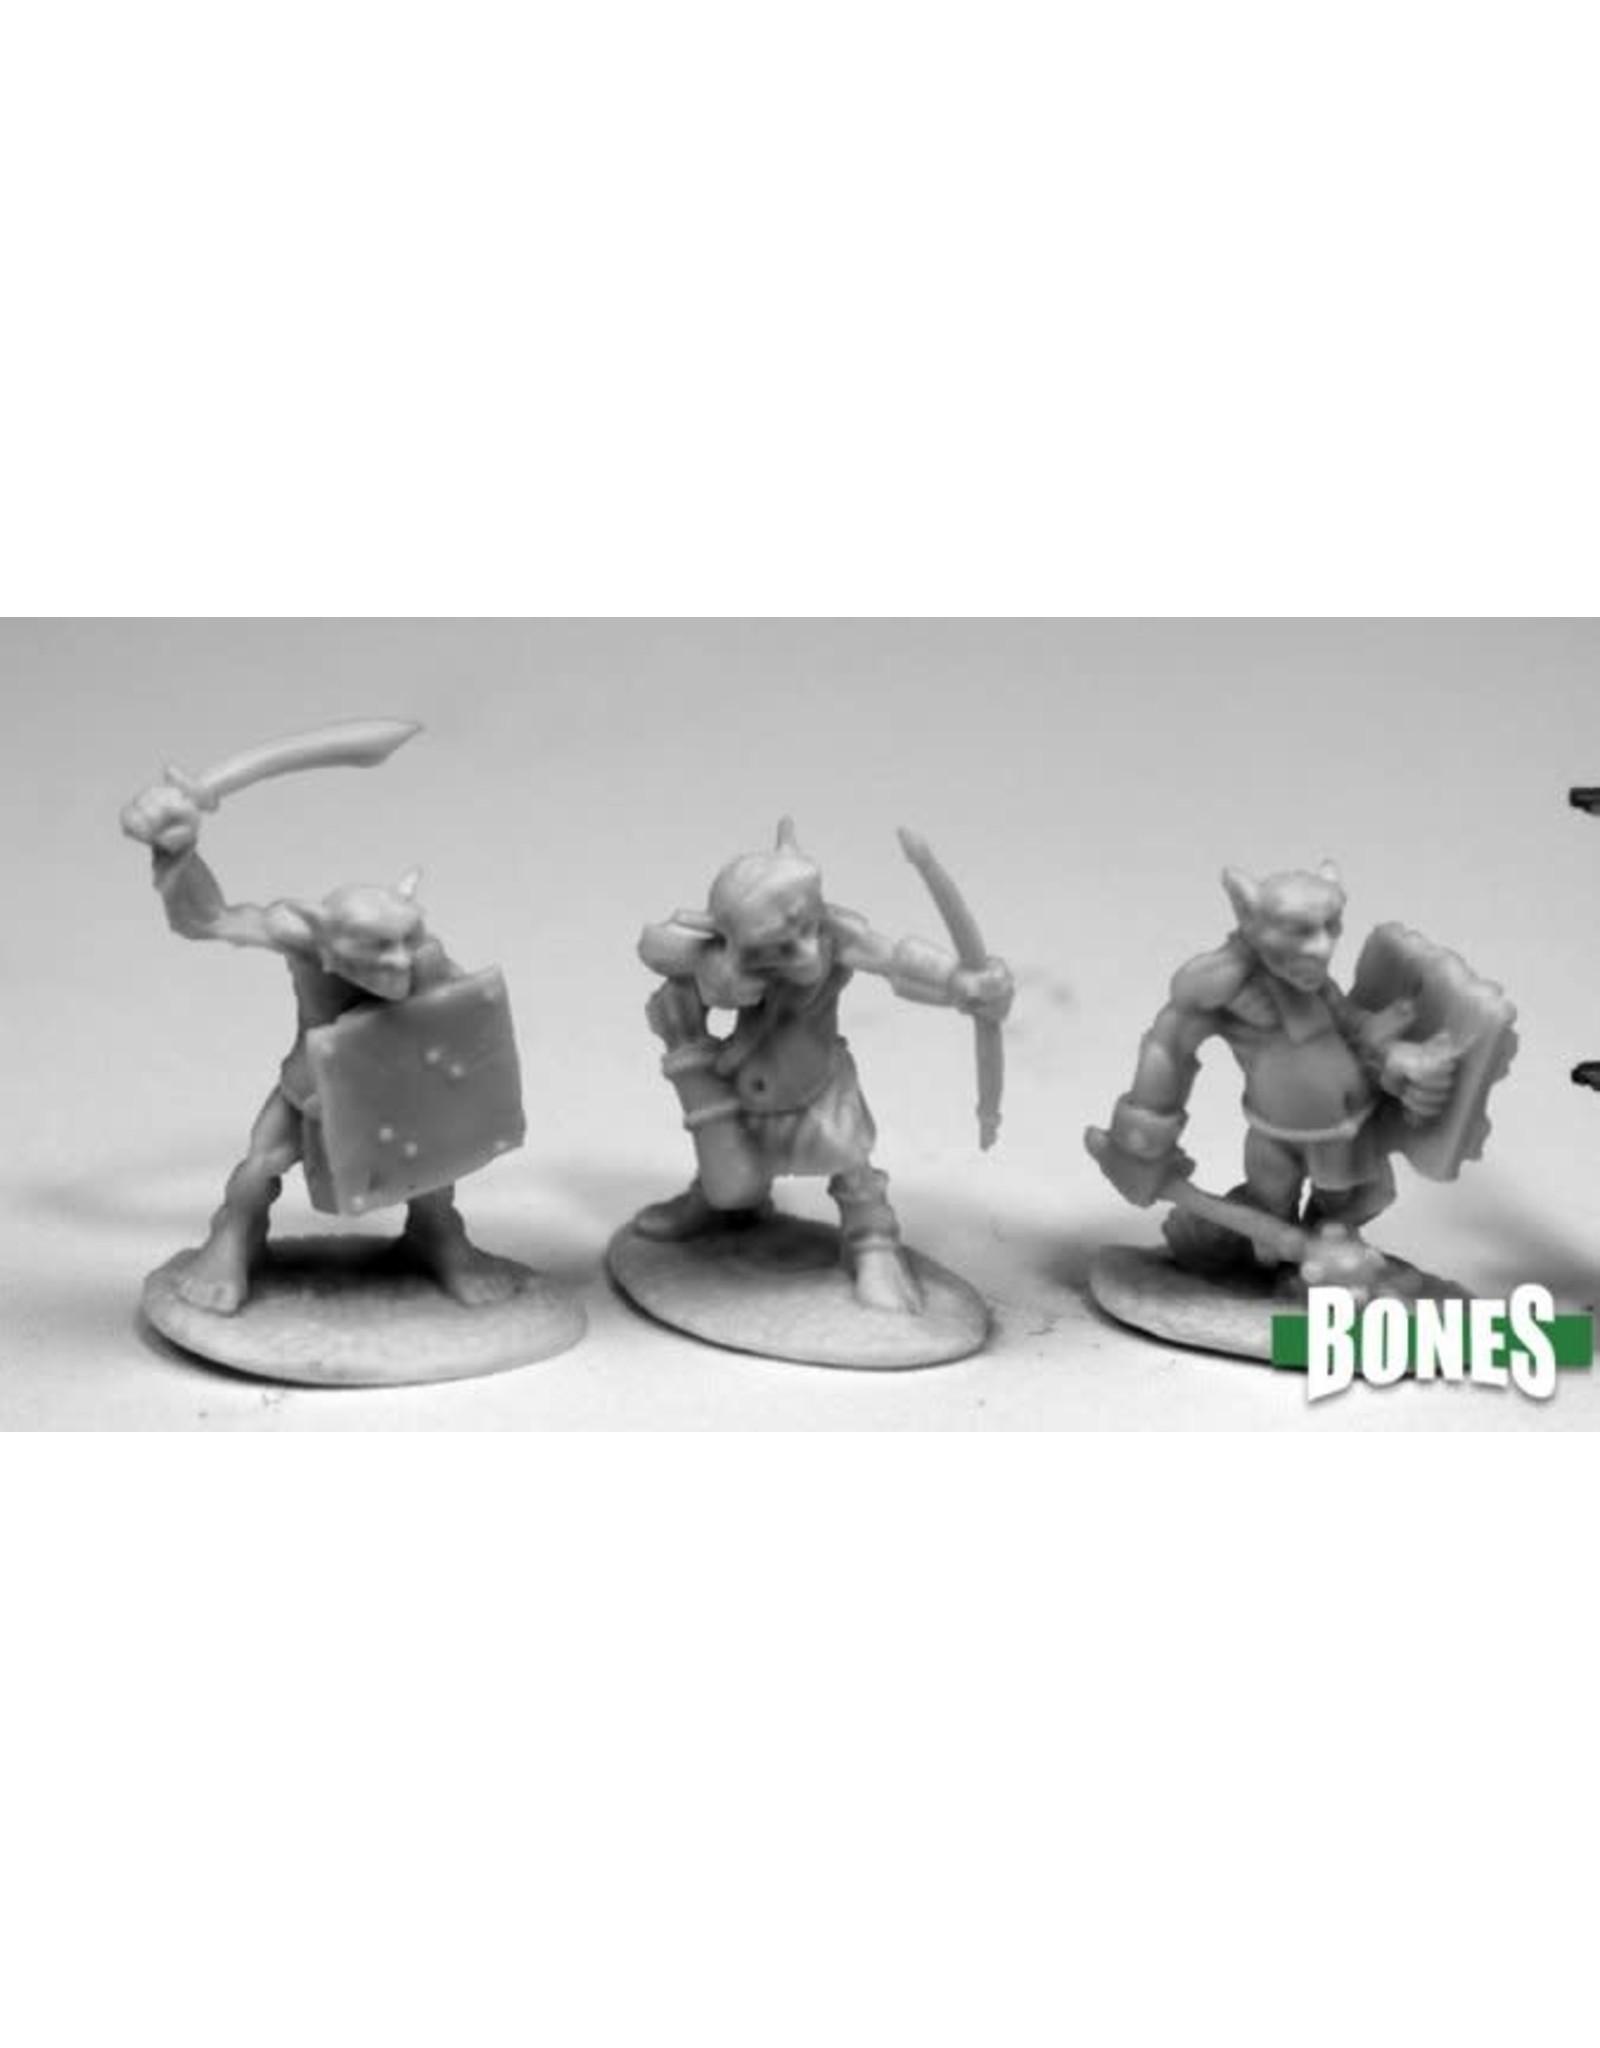 Reaper Miniatures Bones Goblin Skirmishers (6)